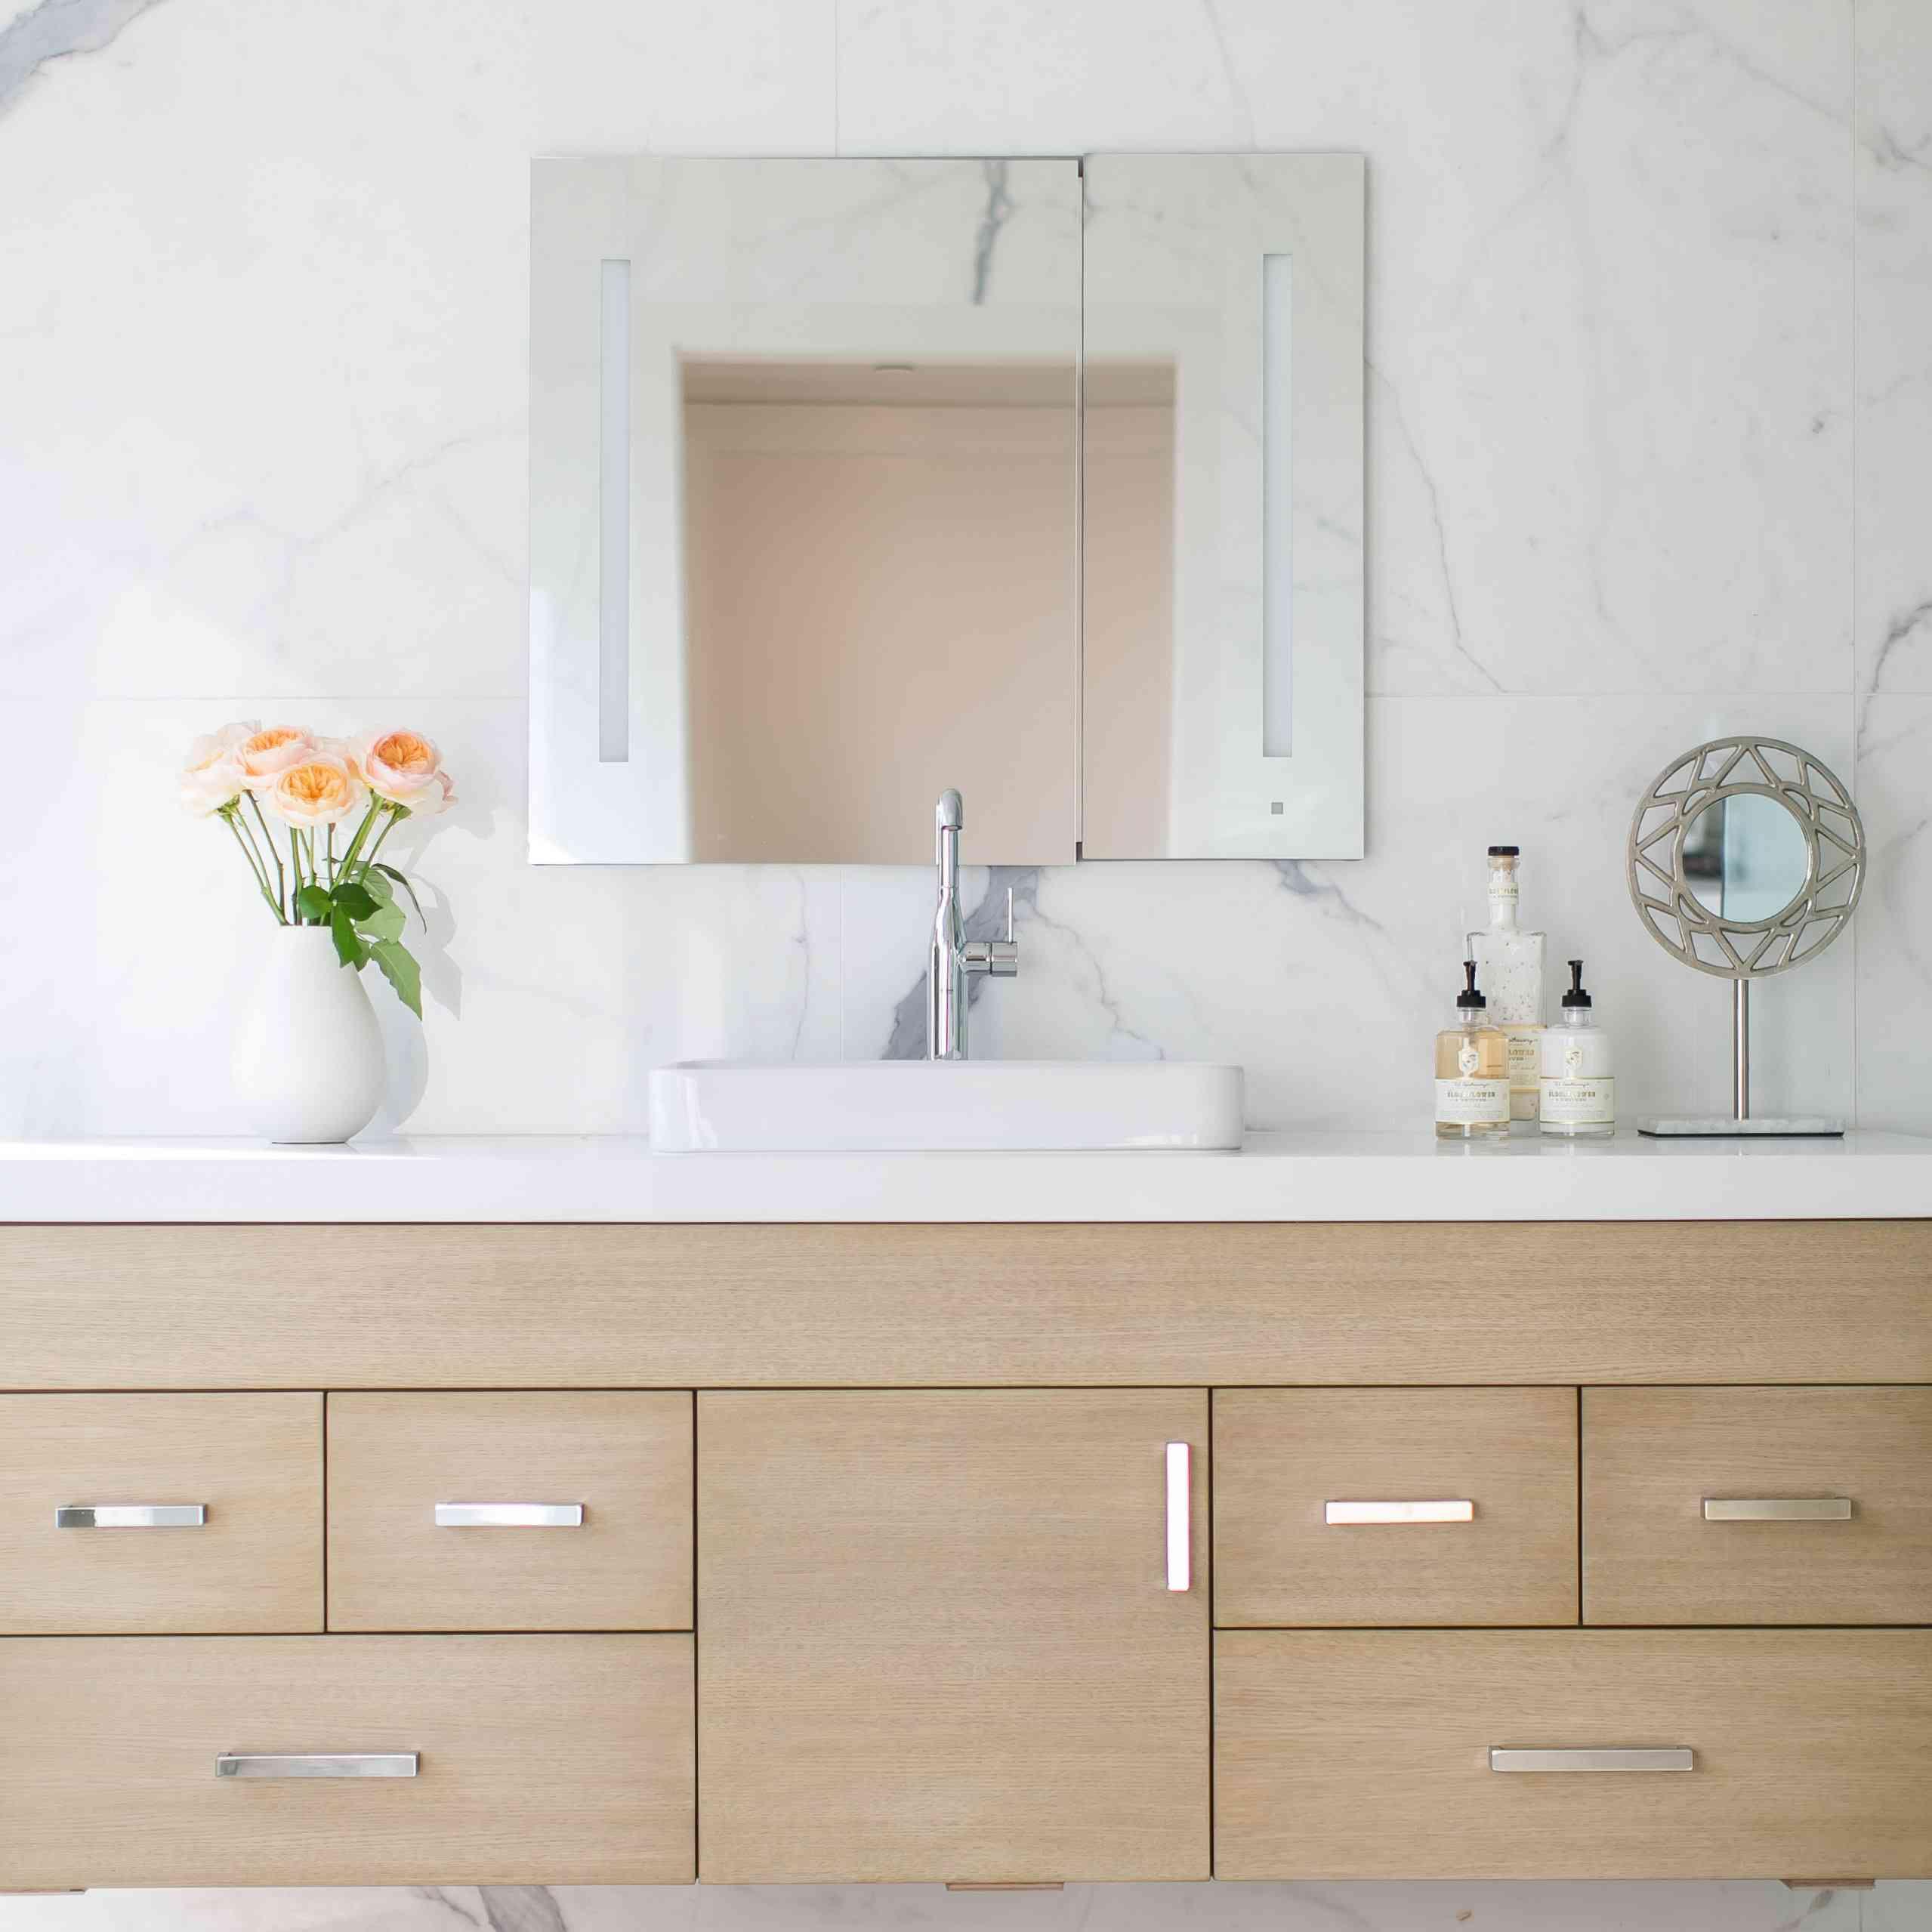 Minimalist bathroom with wood cabinets